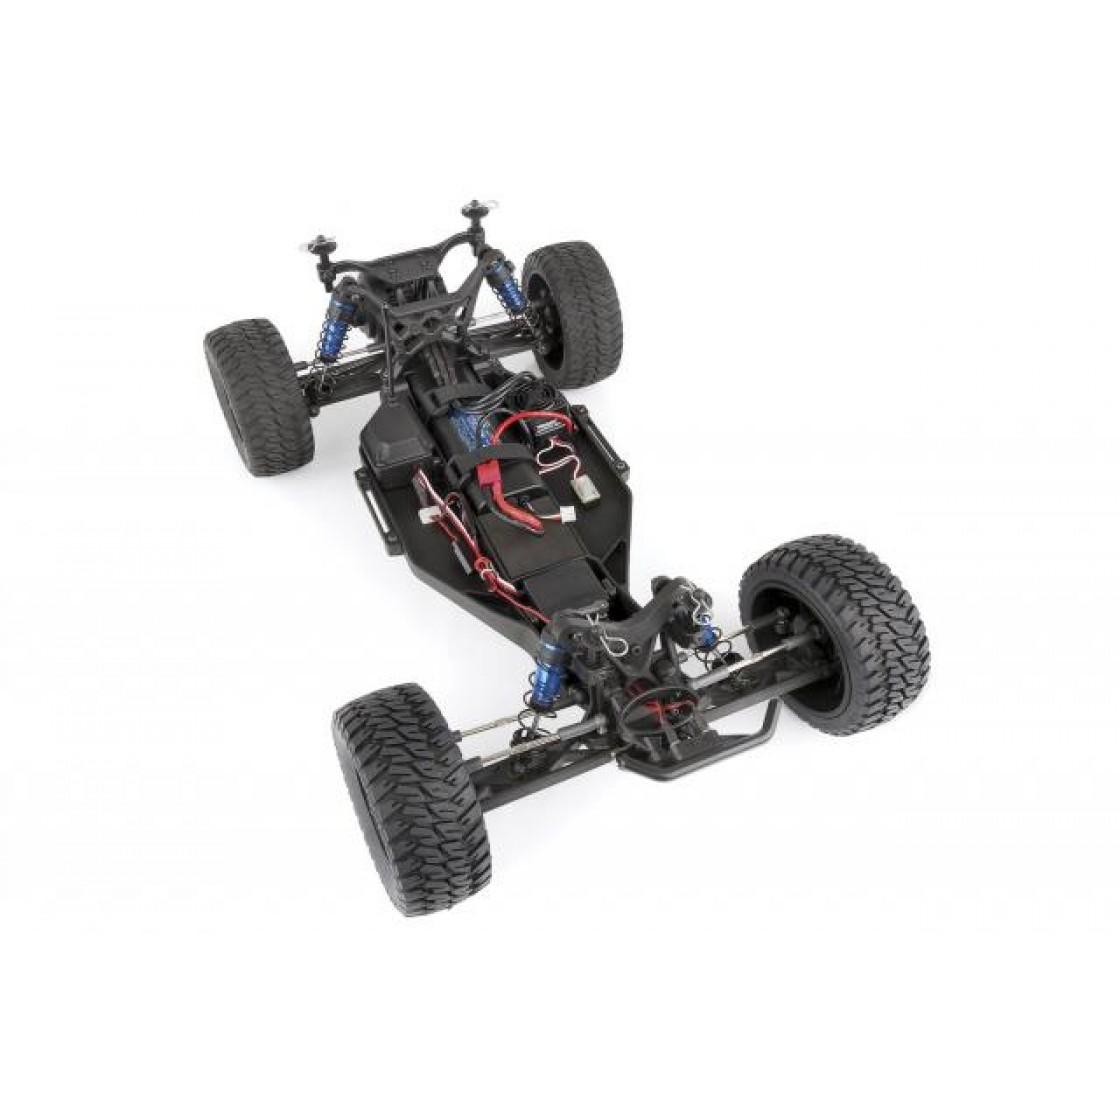 Team Associated Reflex DB10 Buggy Brushless 2WD RTR 05